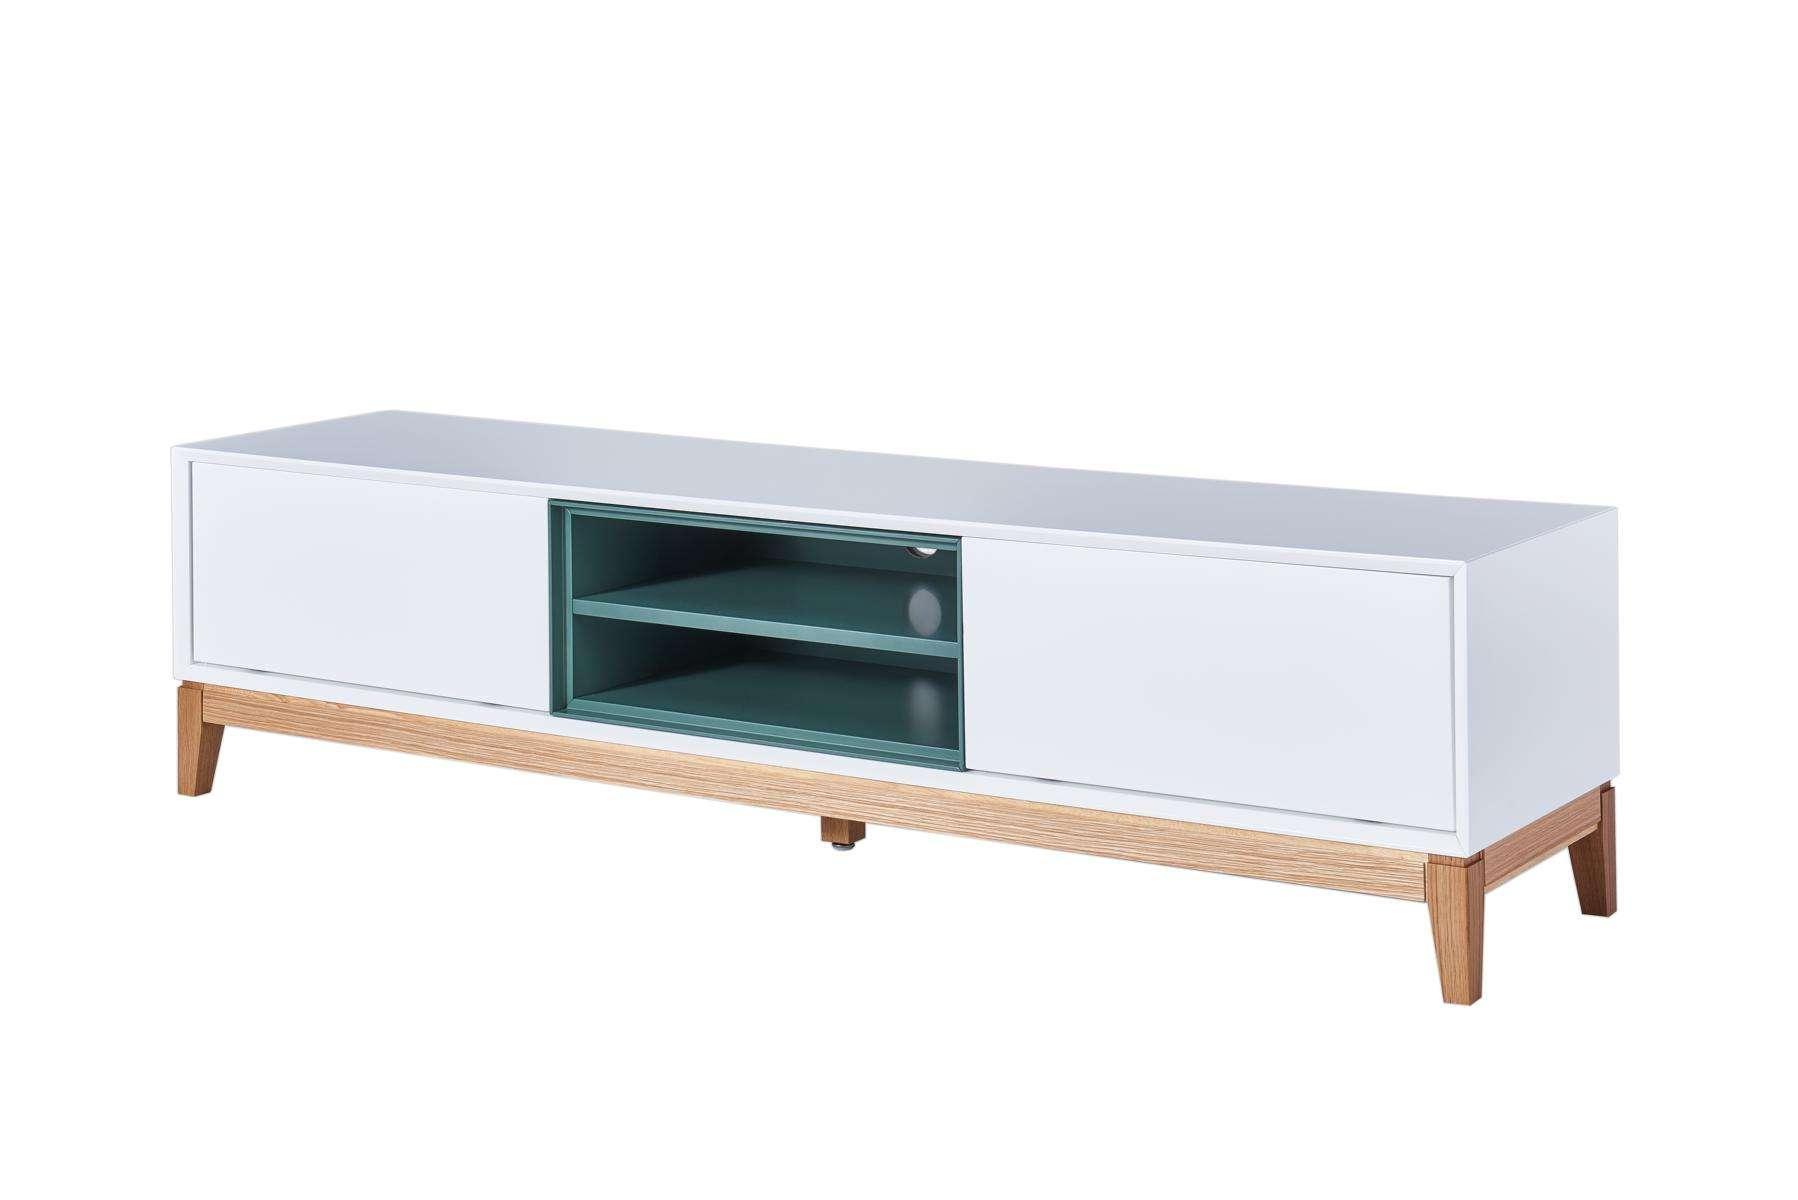 lowboard hochglanz grau lowboard grau hochglanz elegant fabelhaft tv bank grau lowboard ikea. Black Bedroom Furniture Sets. Home Design Ideas